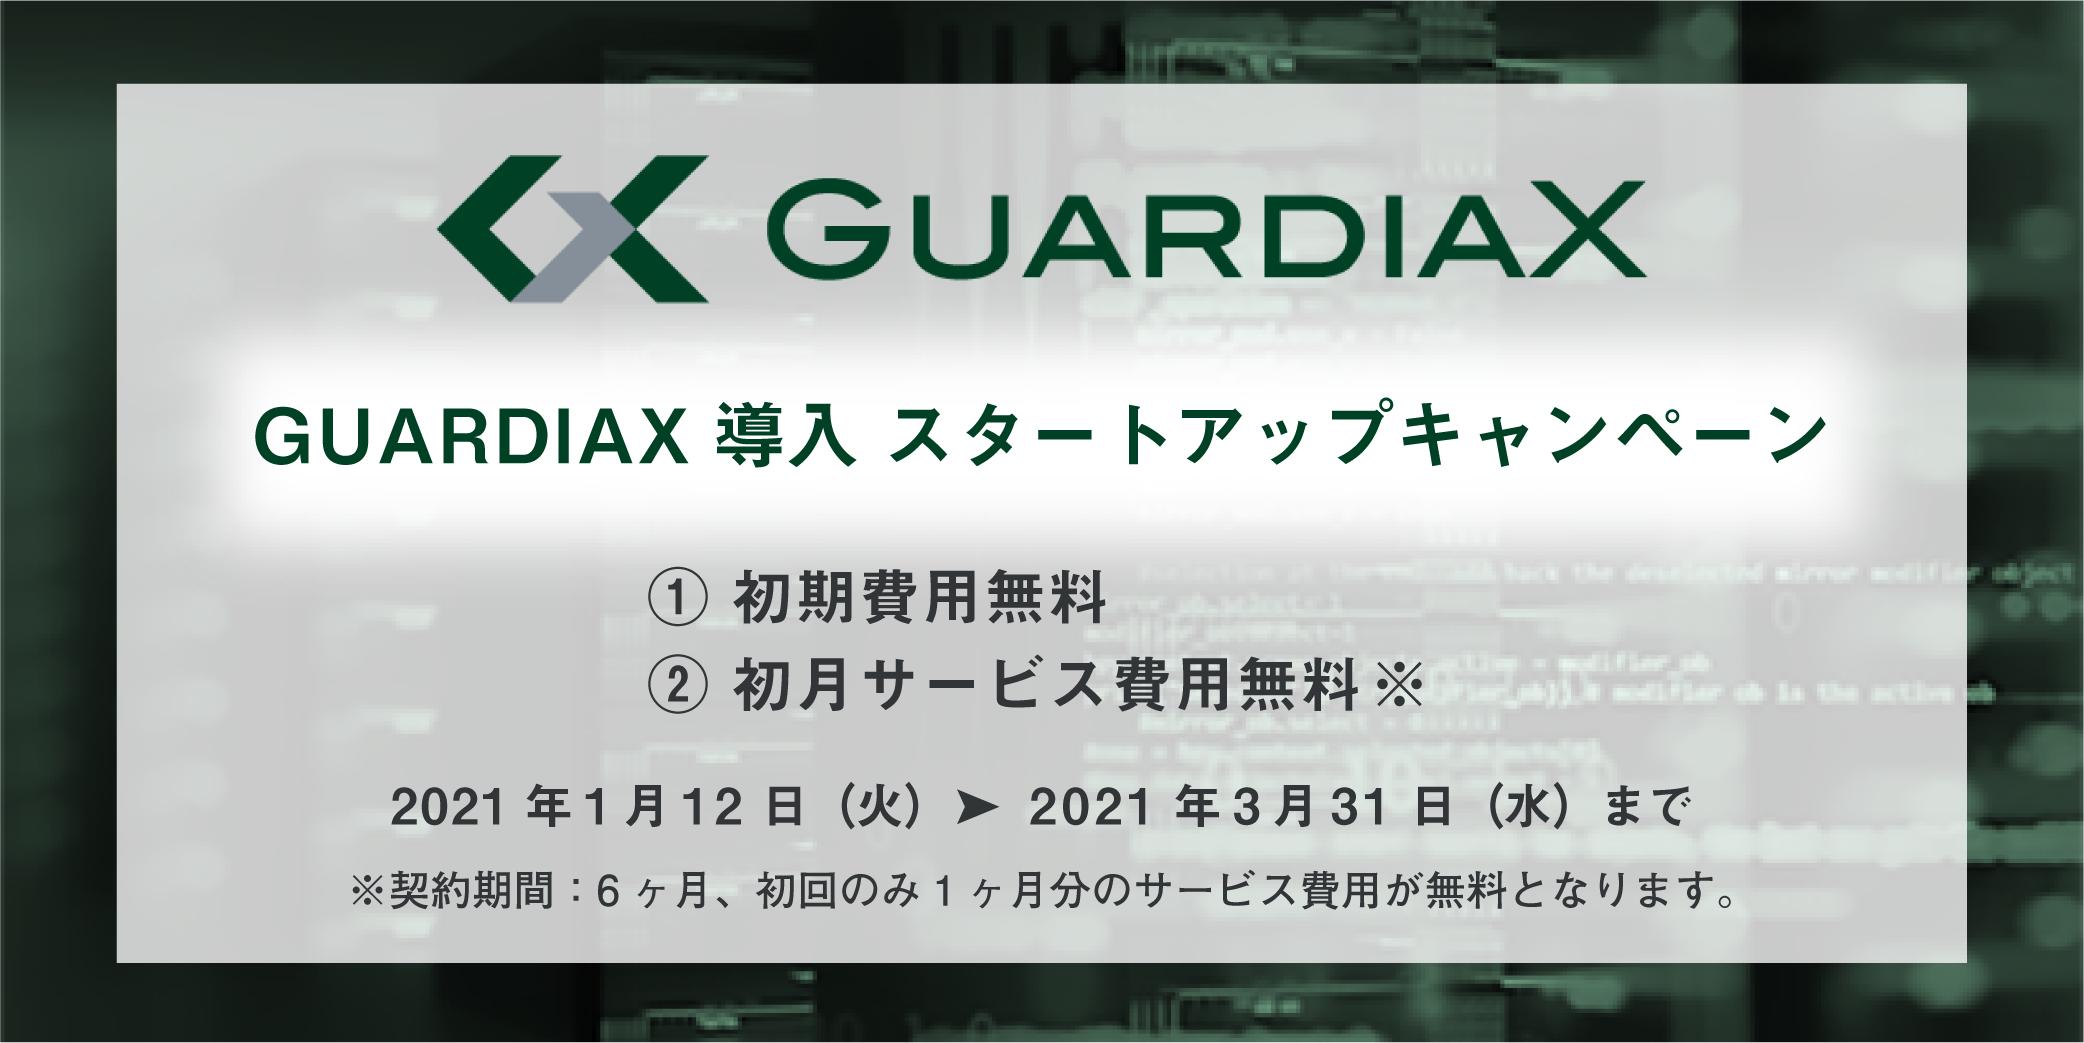 GUARDIAXキャンペーン